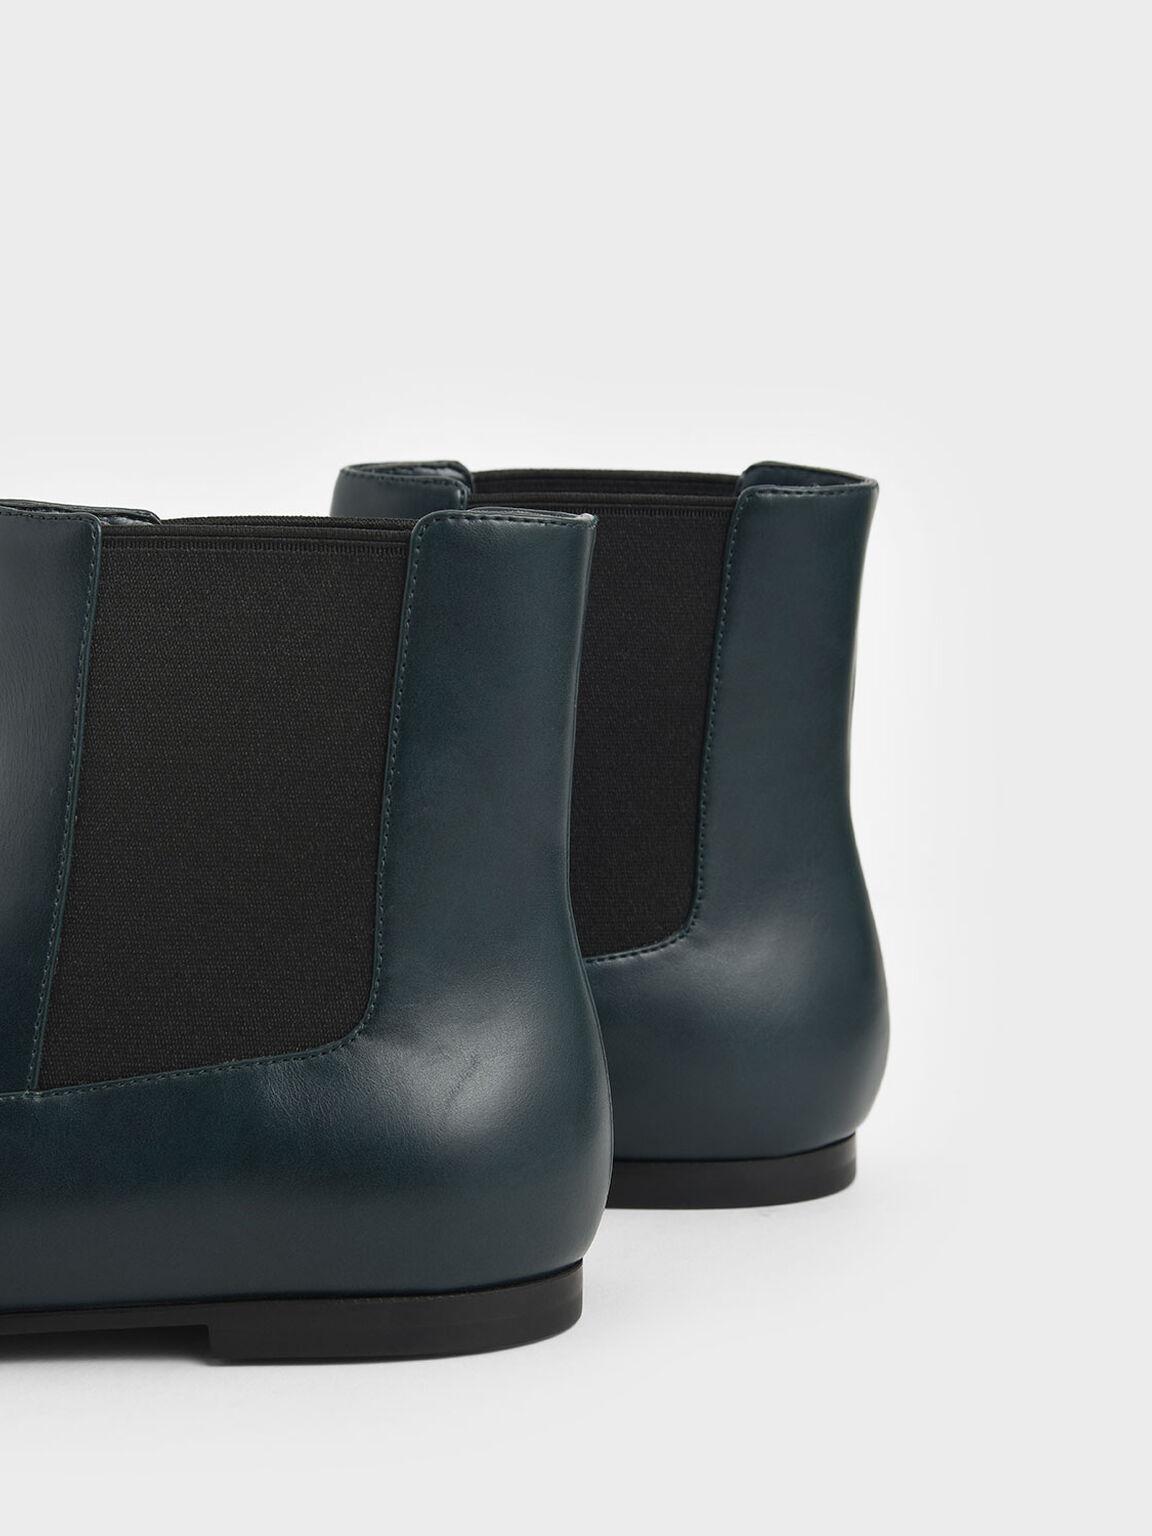 Metallic Knot Accent Chelsea Boots, Green, hi-res